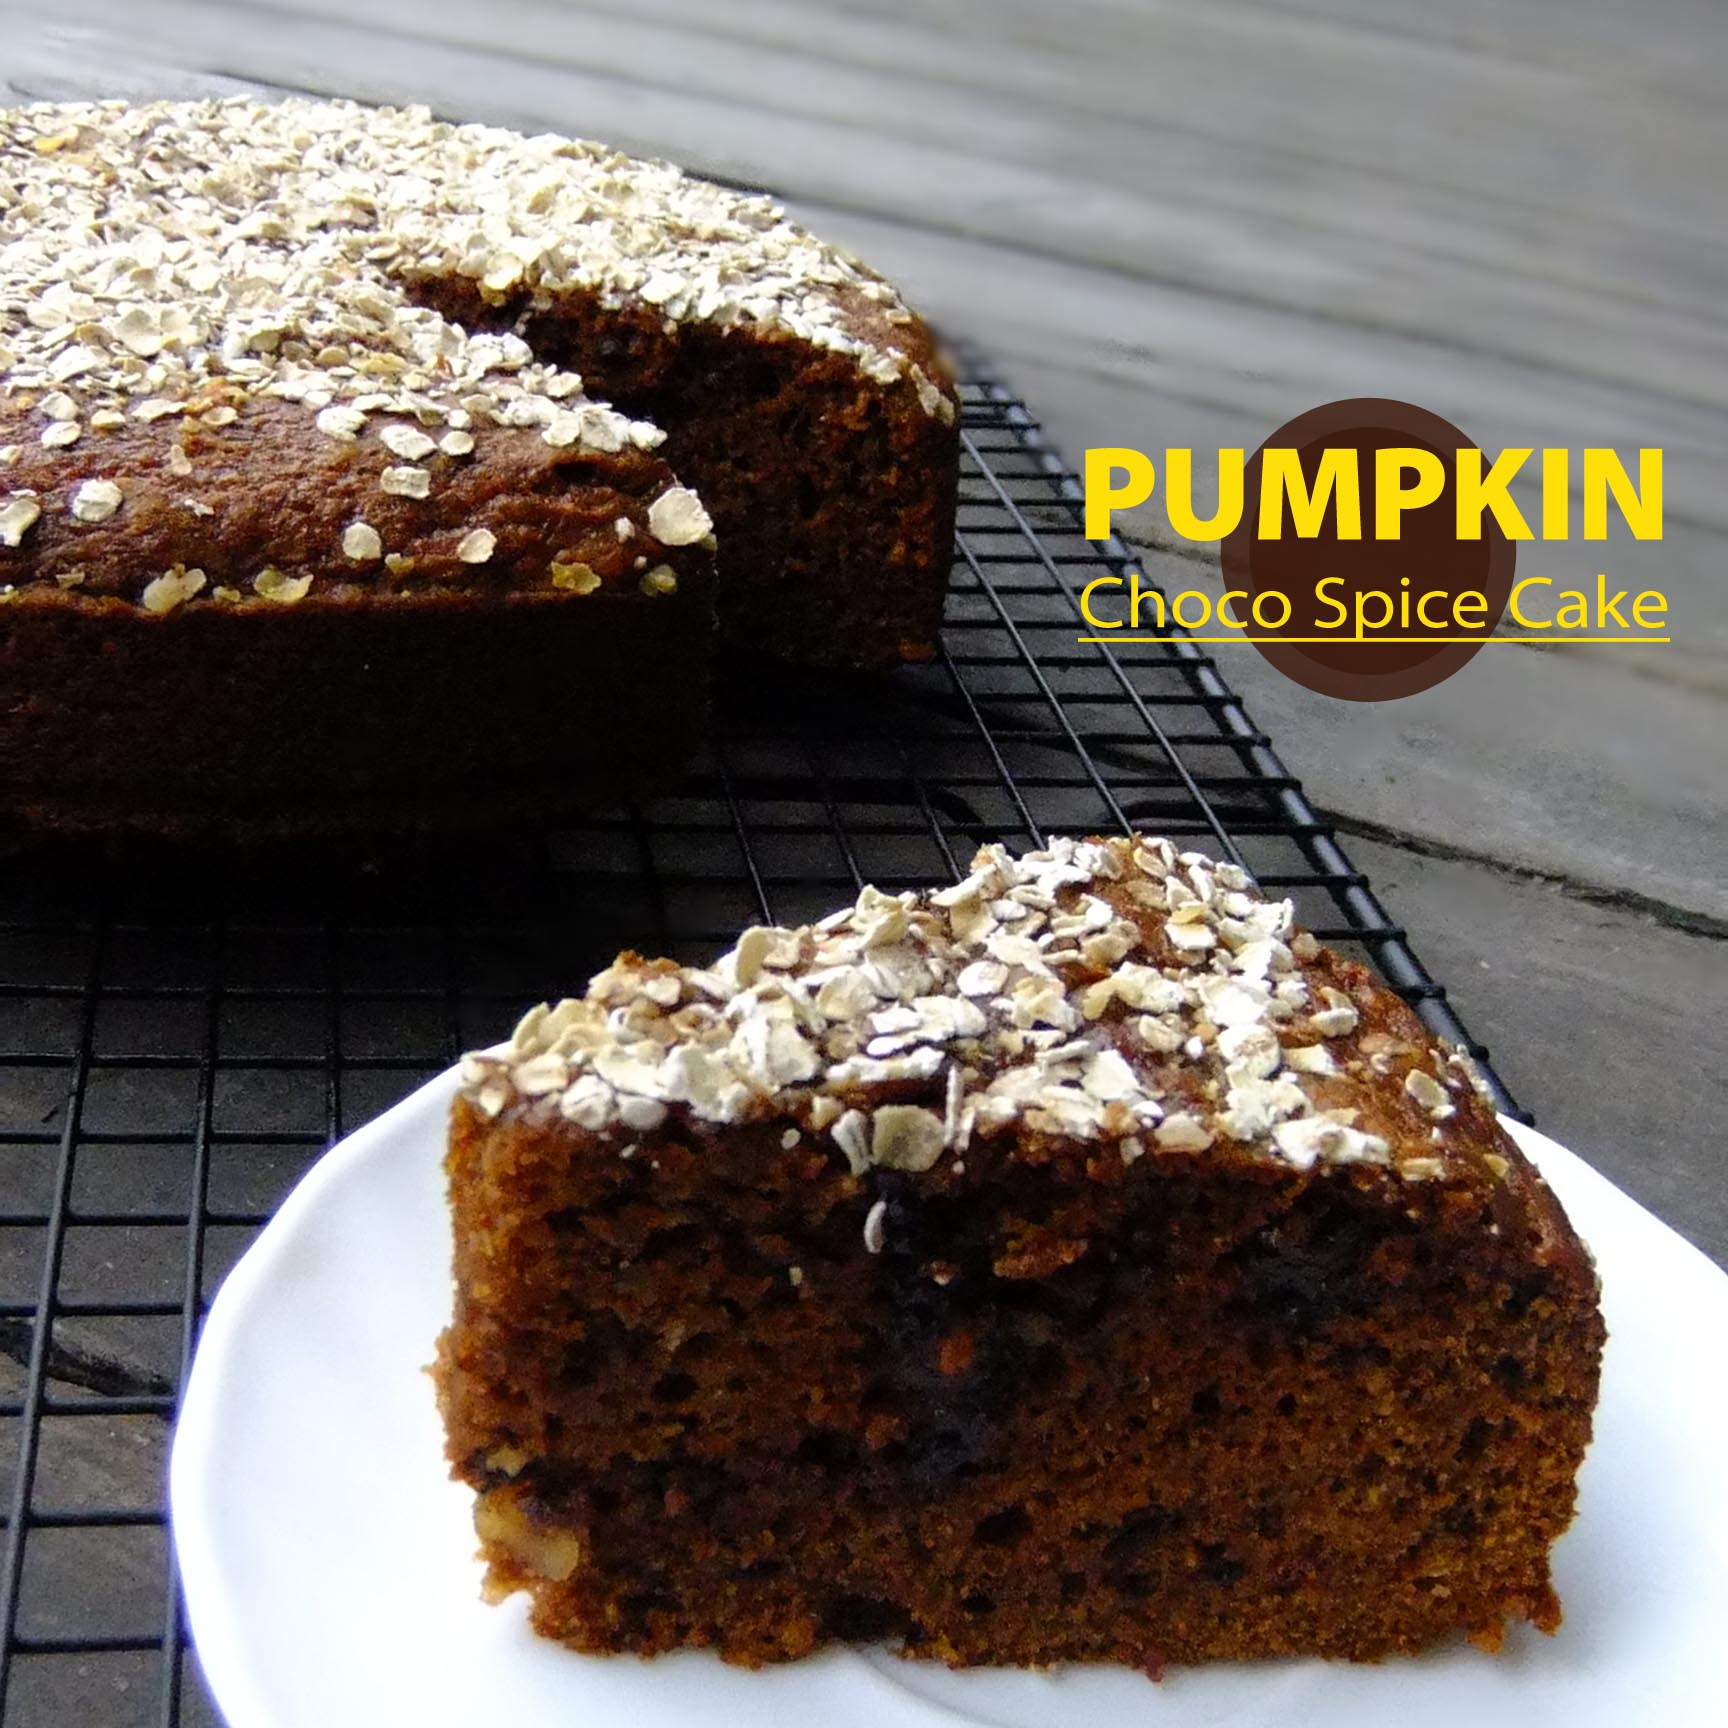 PUMPKIN CHOCO SPICE CAKE copy